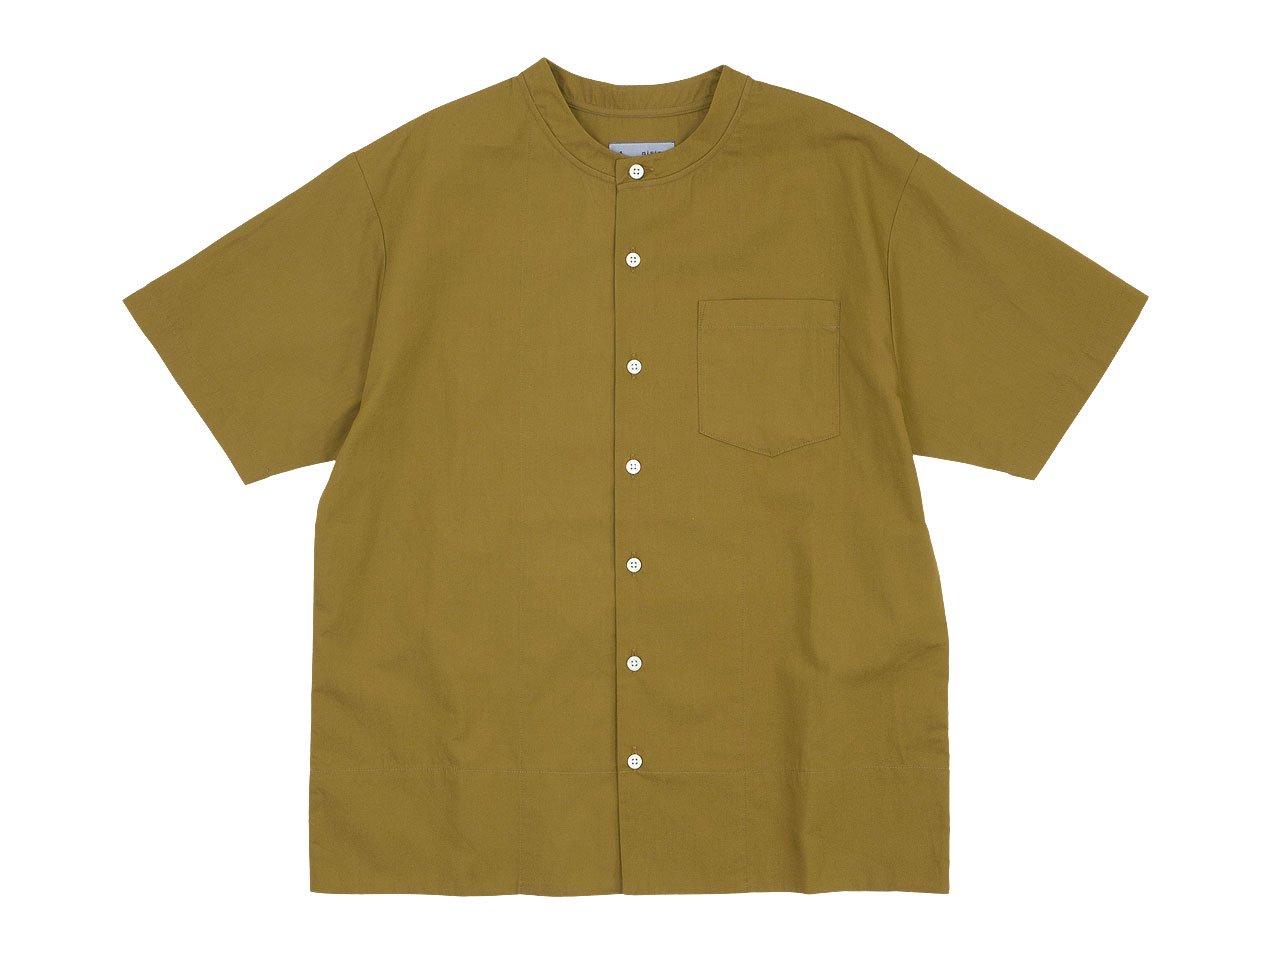 nisica ベスボールシャツ 半袖 CAMEL